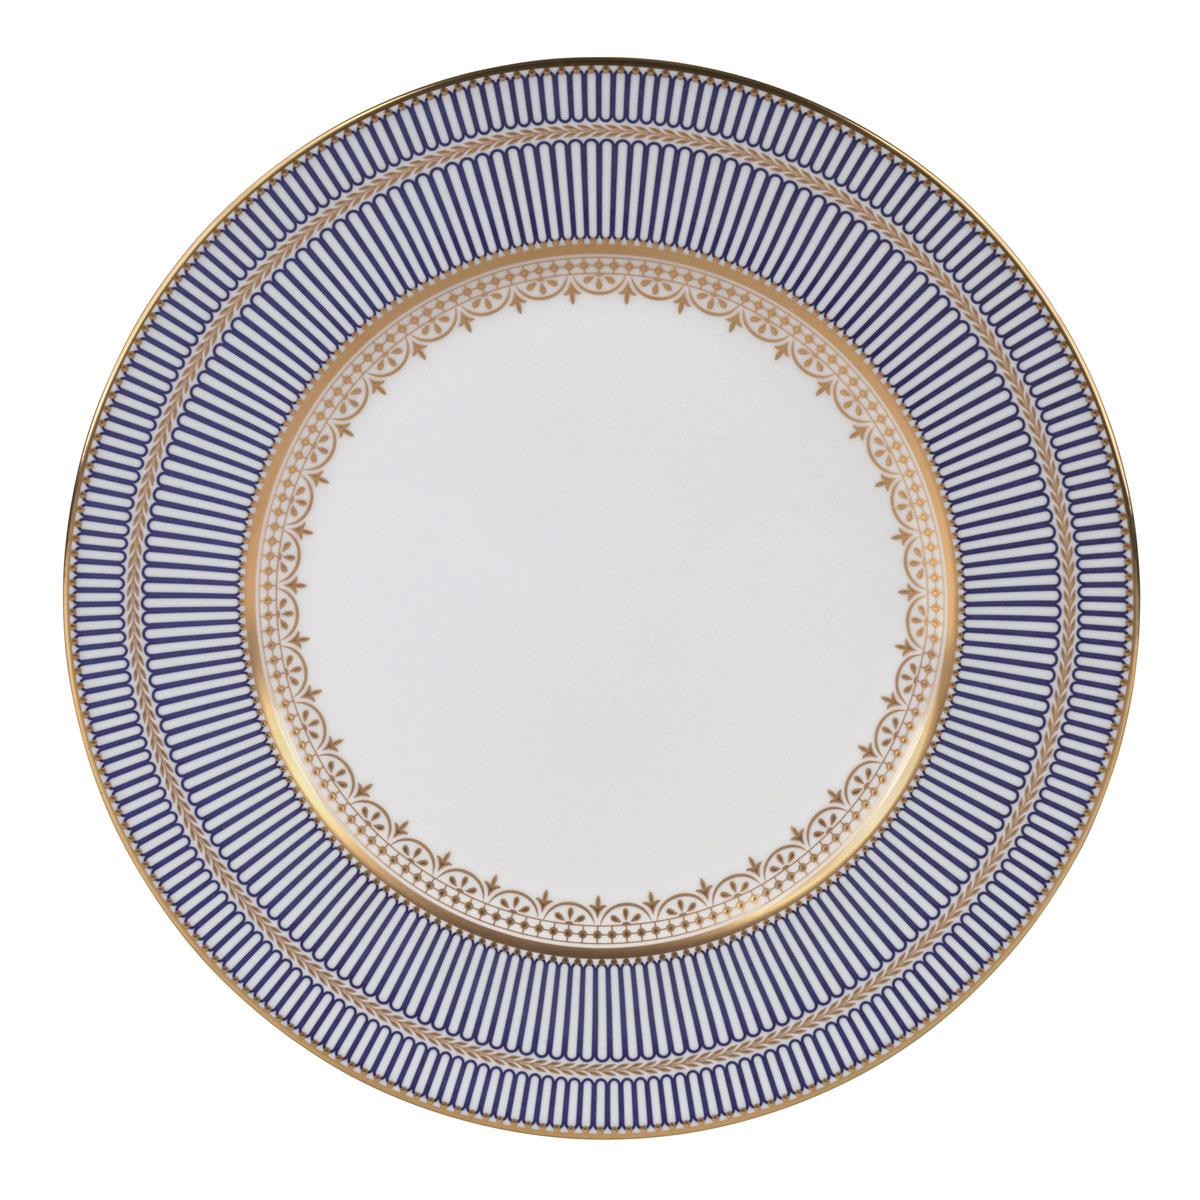 Wedgwood Anthemion Blue Dinner Plate, Single